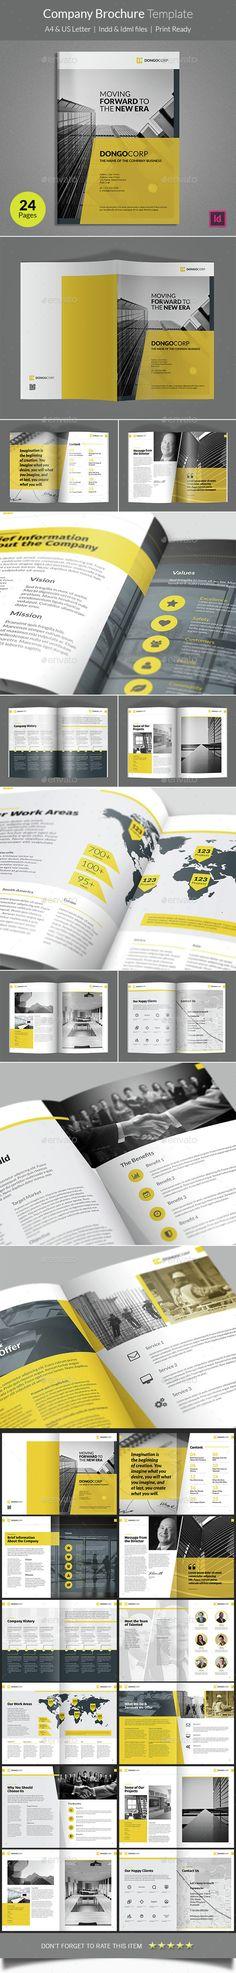 Company Brochure Template - #Corporate #Brochures | Download http://graphicriver.net/item/company-brochure-template/15143040?ref=sinzo